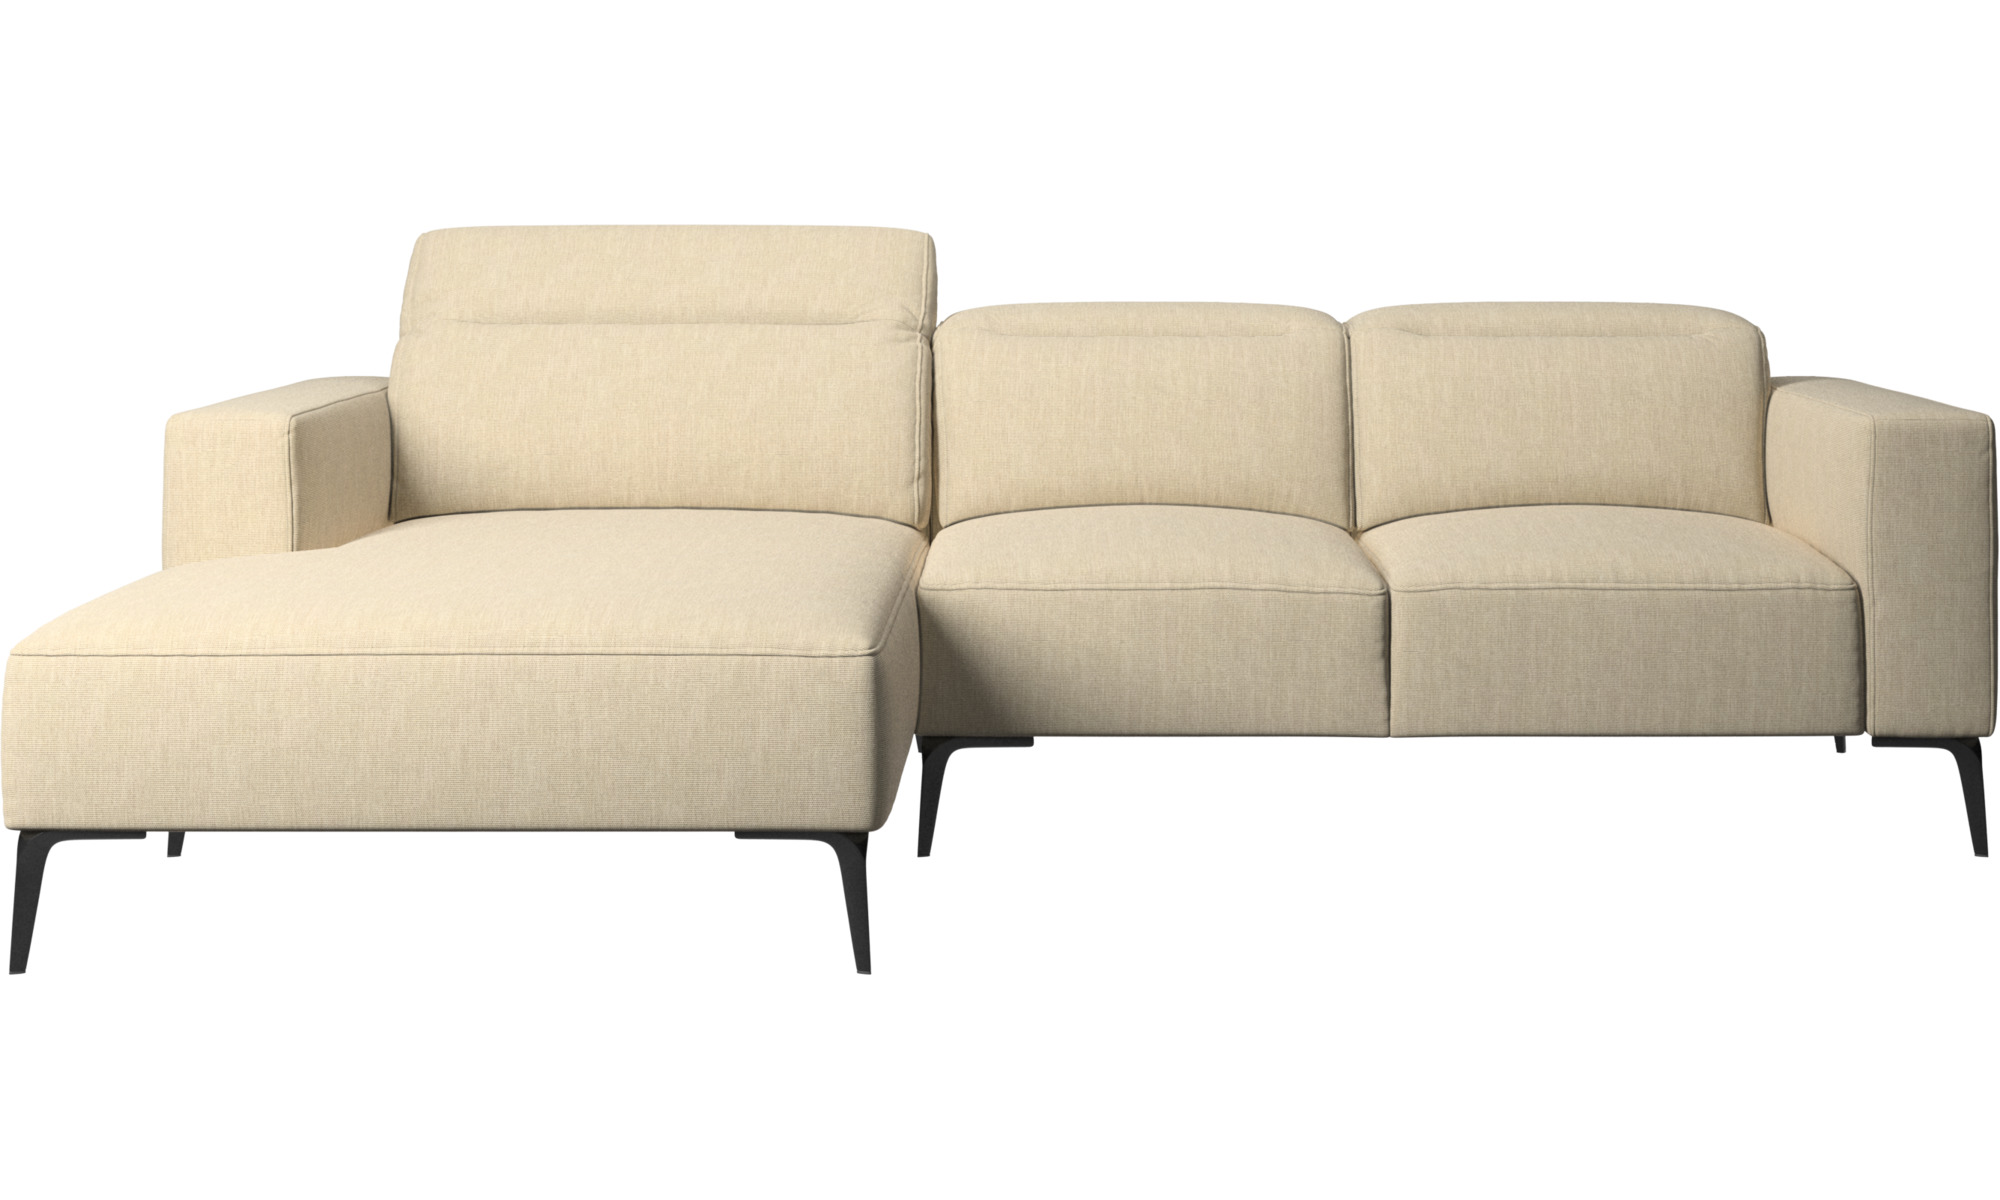 Picture of: Corner Sofas Zurich Sofa With Resting Unit Boconcept